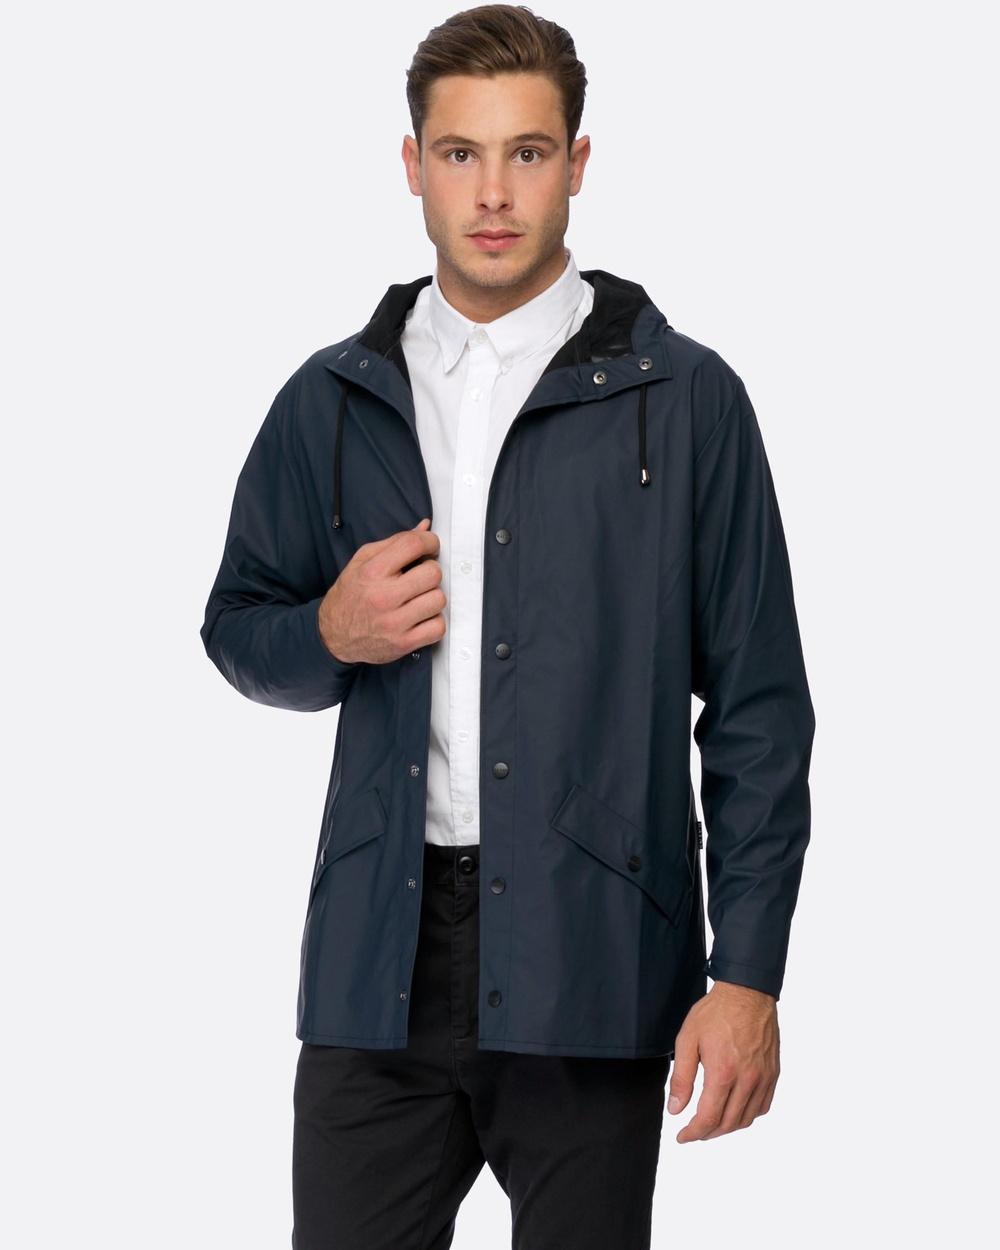 RAINS Jacket Coats & Jackets Blue